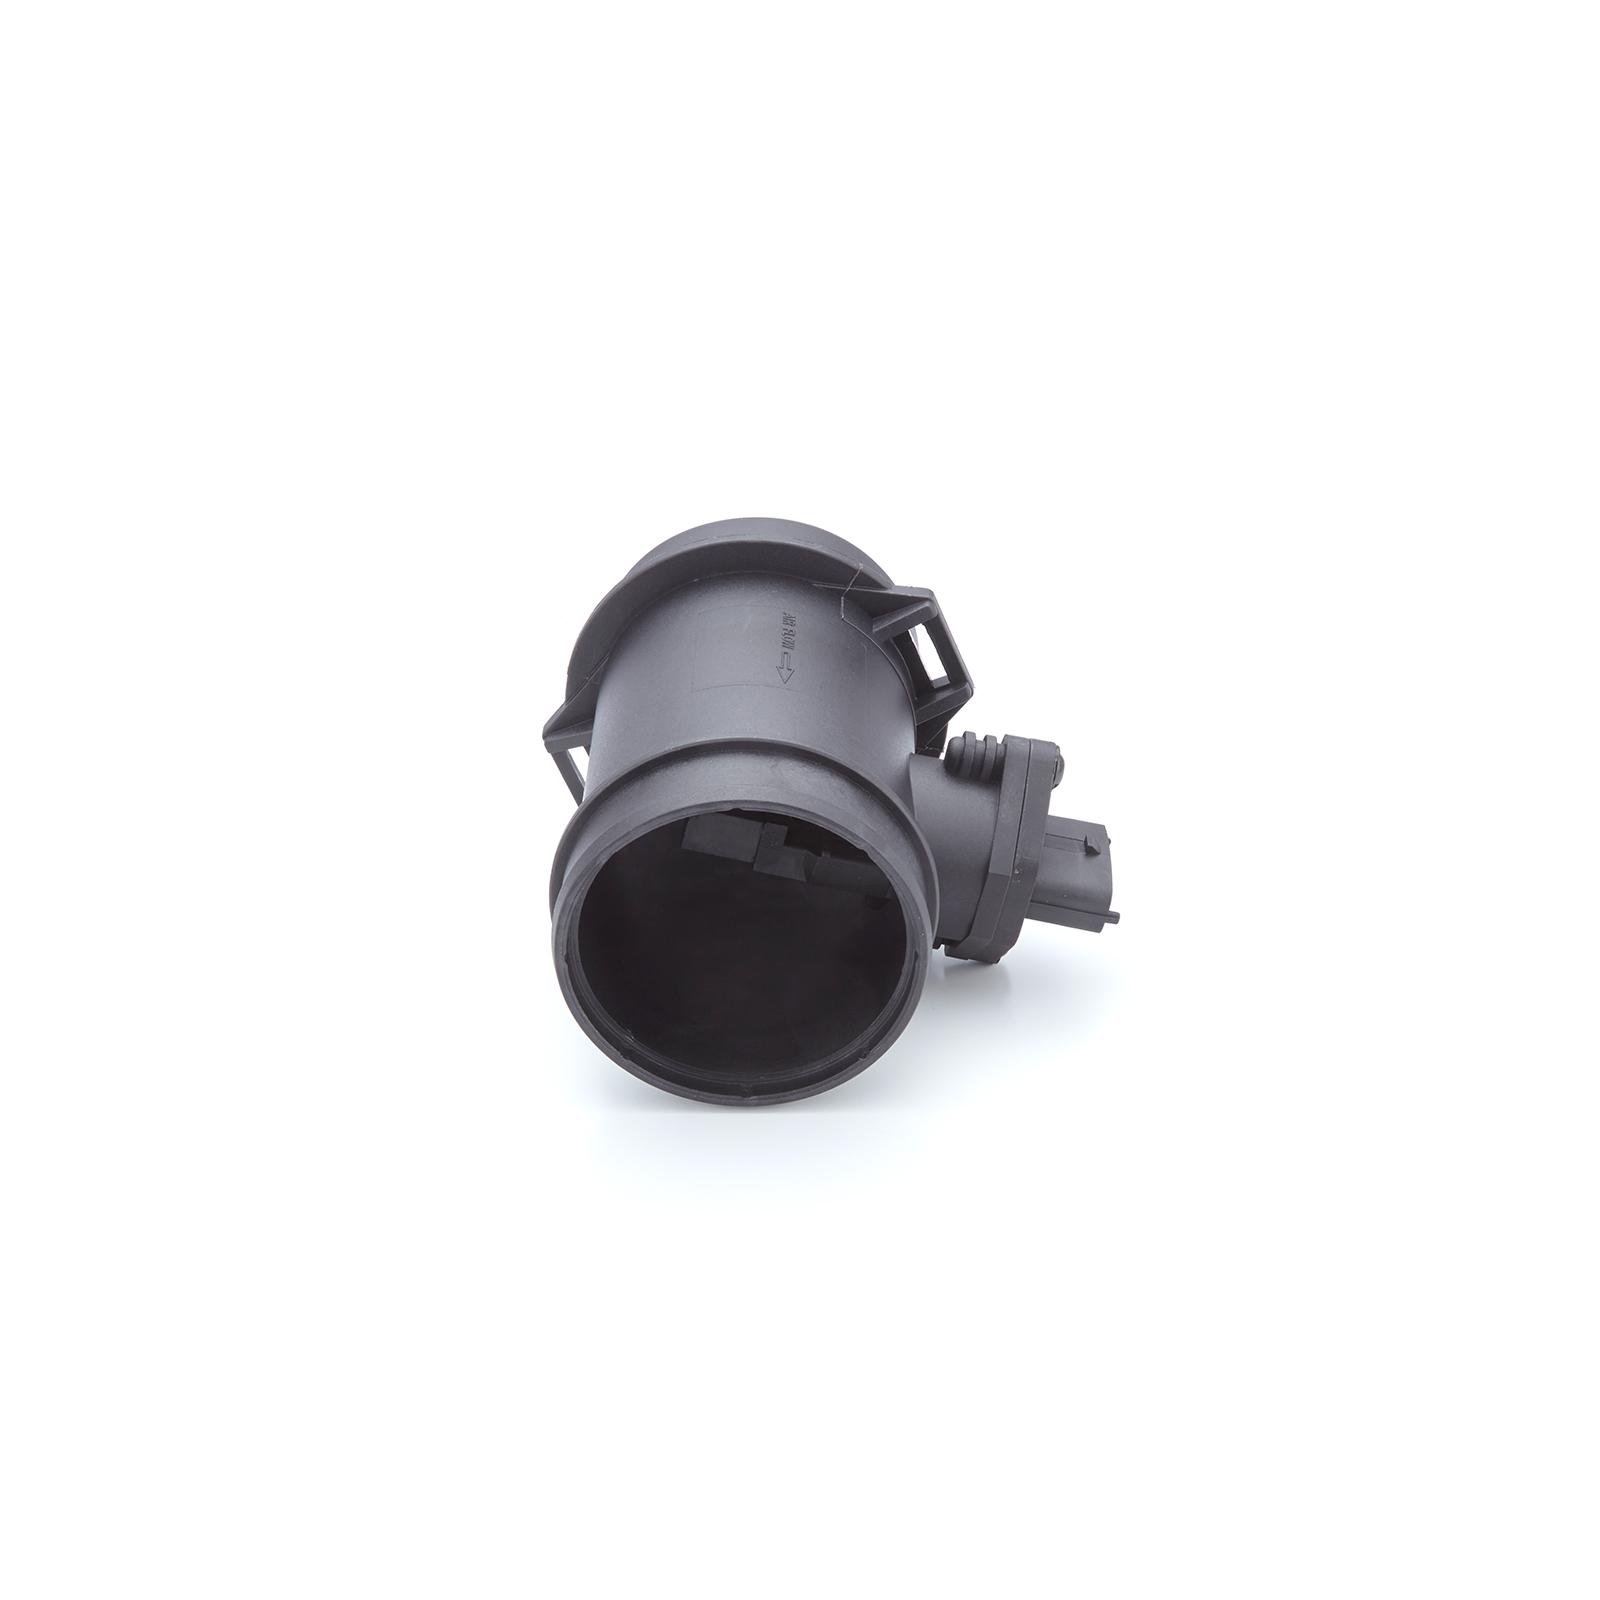 Mass-Air-Flow-Meter-Sensor-For-Honda-MG-Rover-Ferrari Indexbild 7